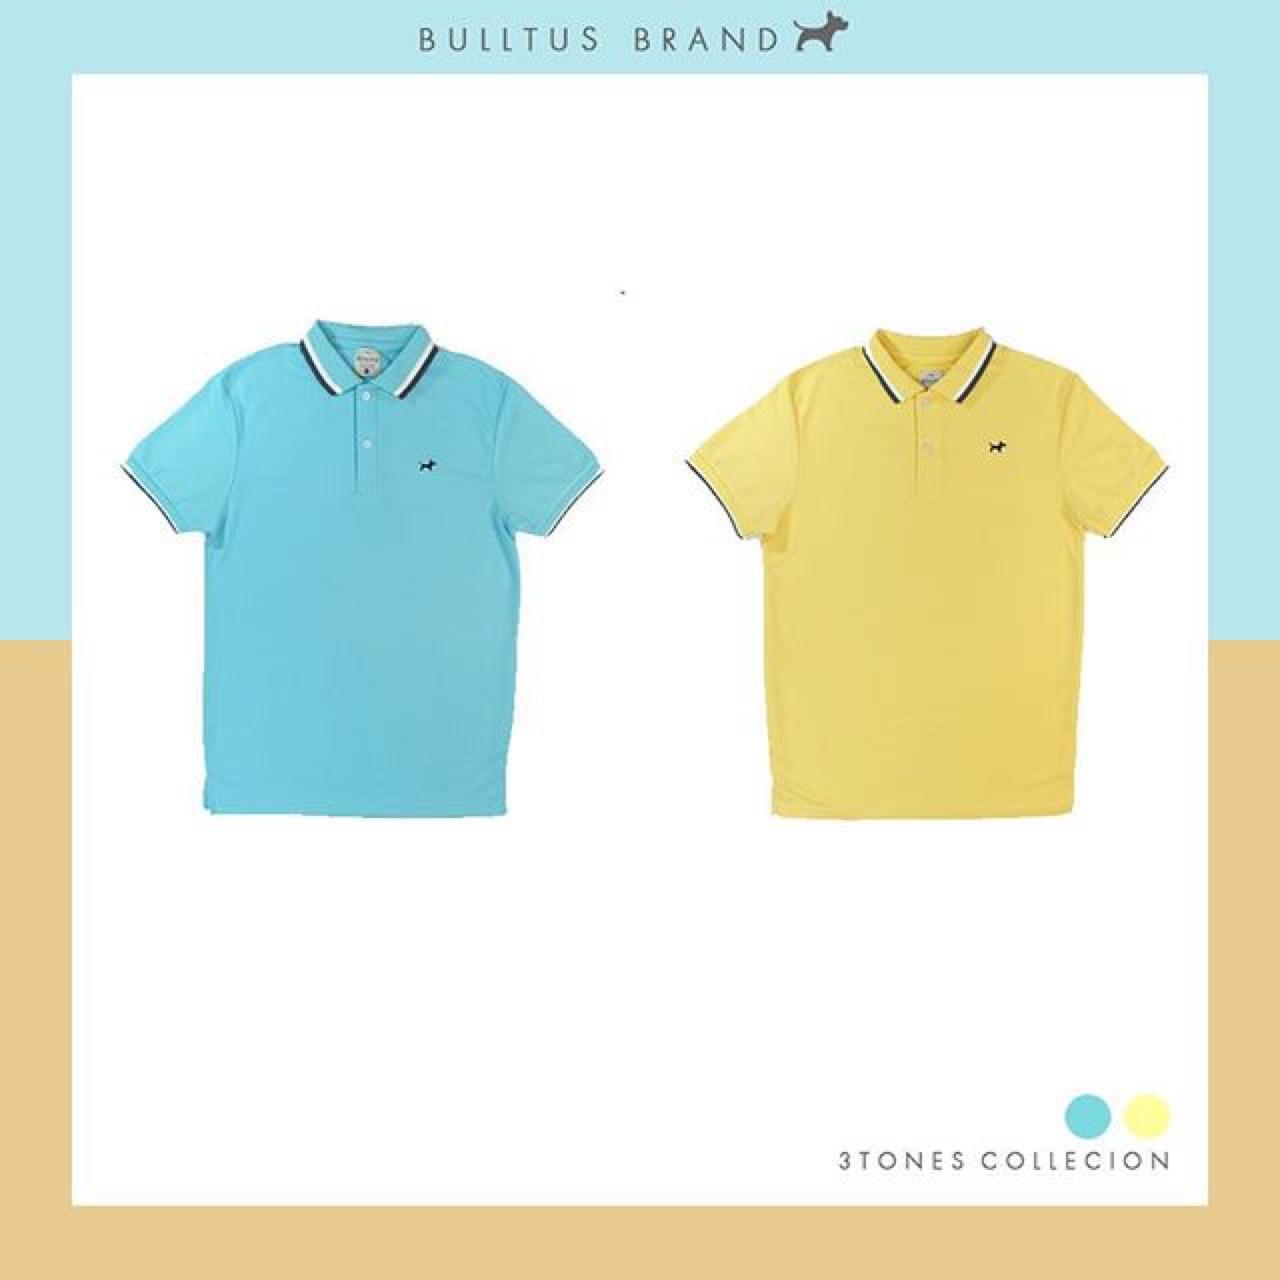 BulltusBrand,เอาใจหนุ่มๆขี้อาย,ก็น่ารักไปอีกแบบ,Polo,Poloshirt,Shirt,Bulltus,PoloBilltus